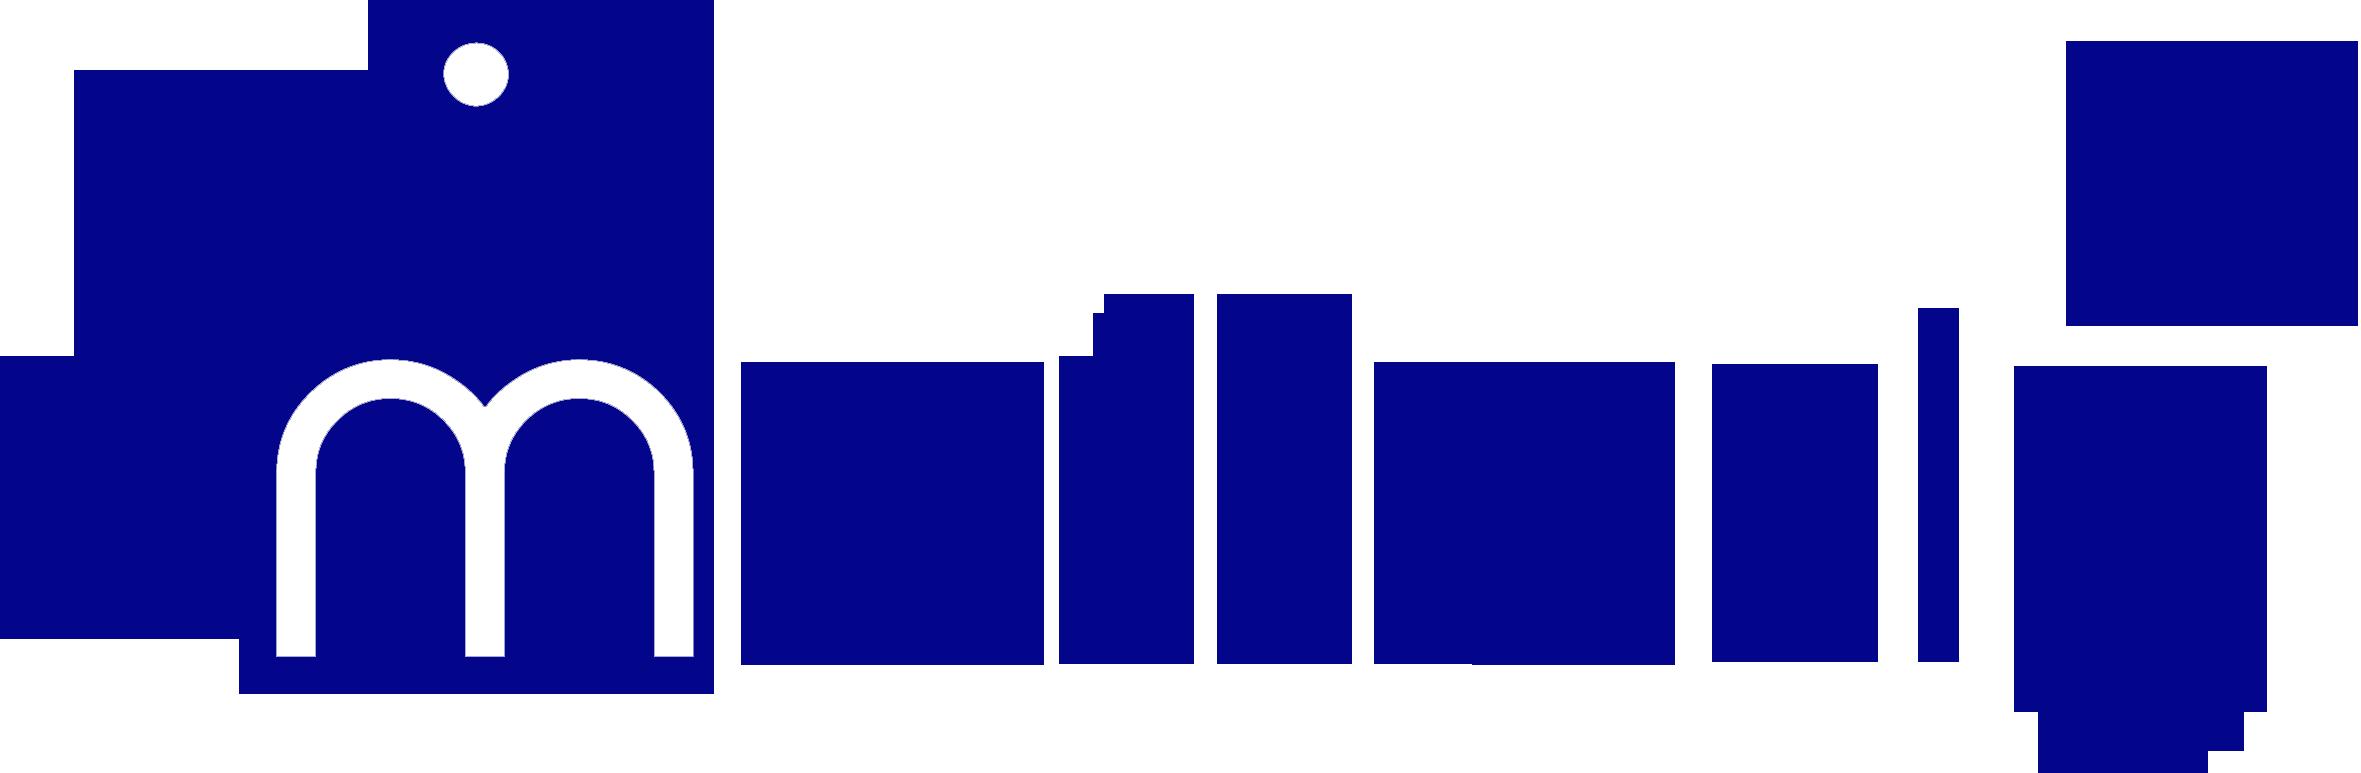 MofferlyLearning